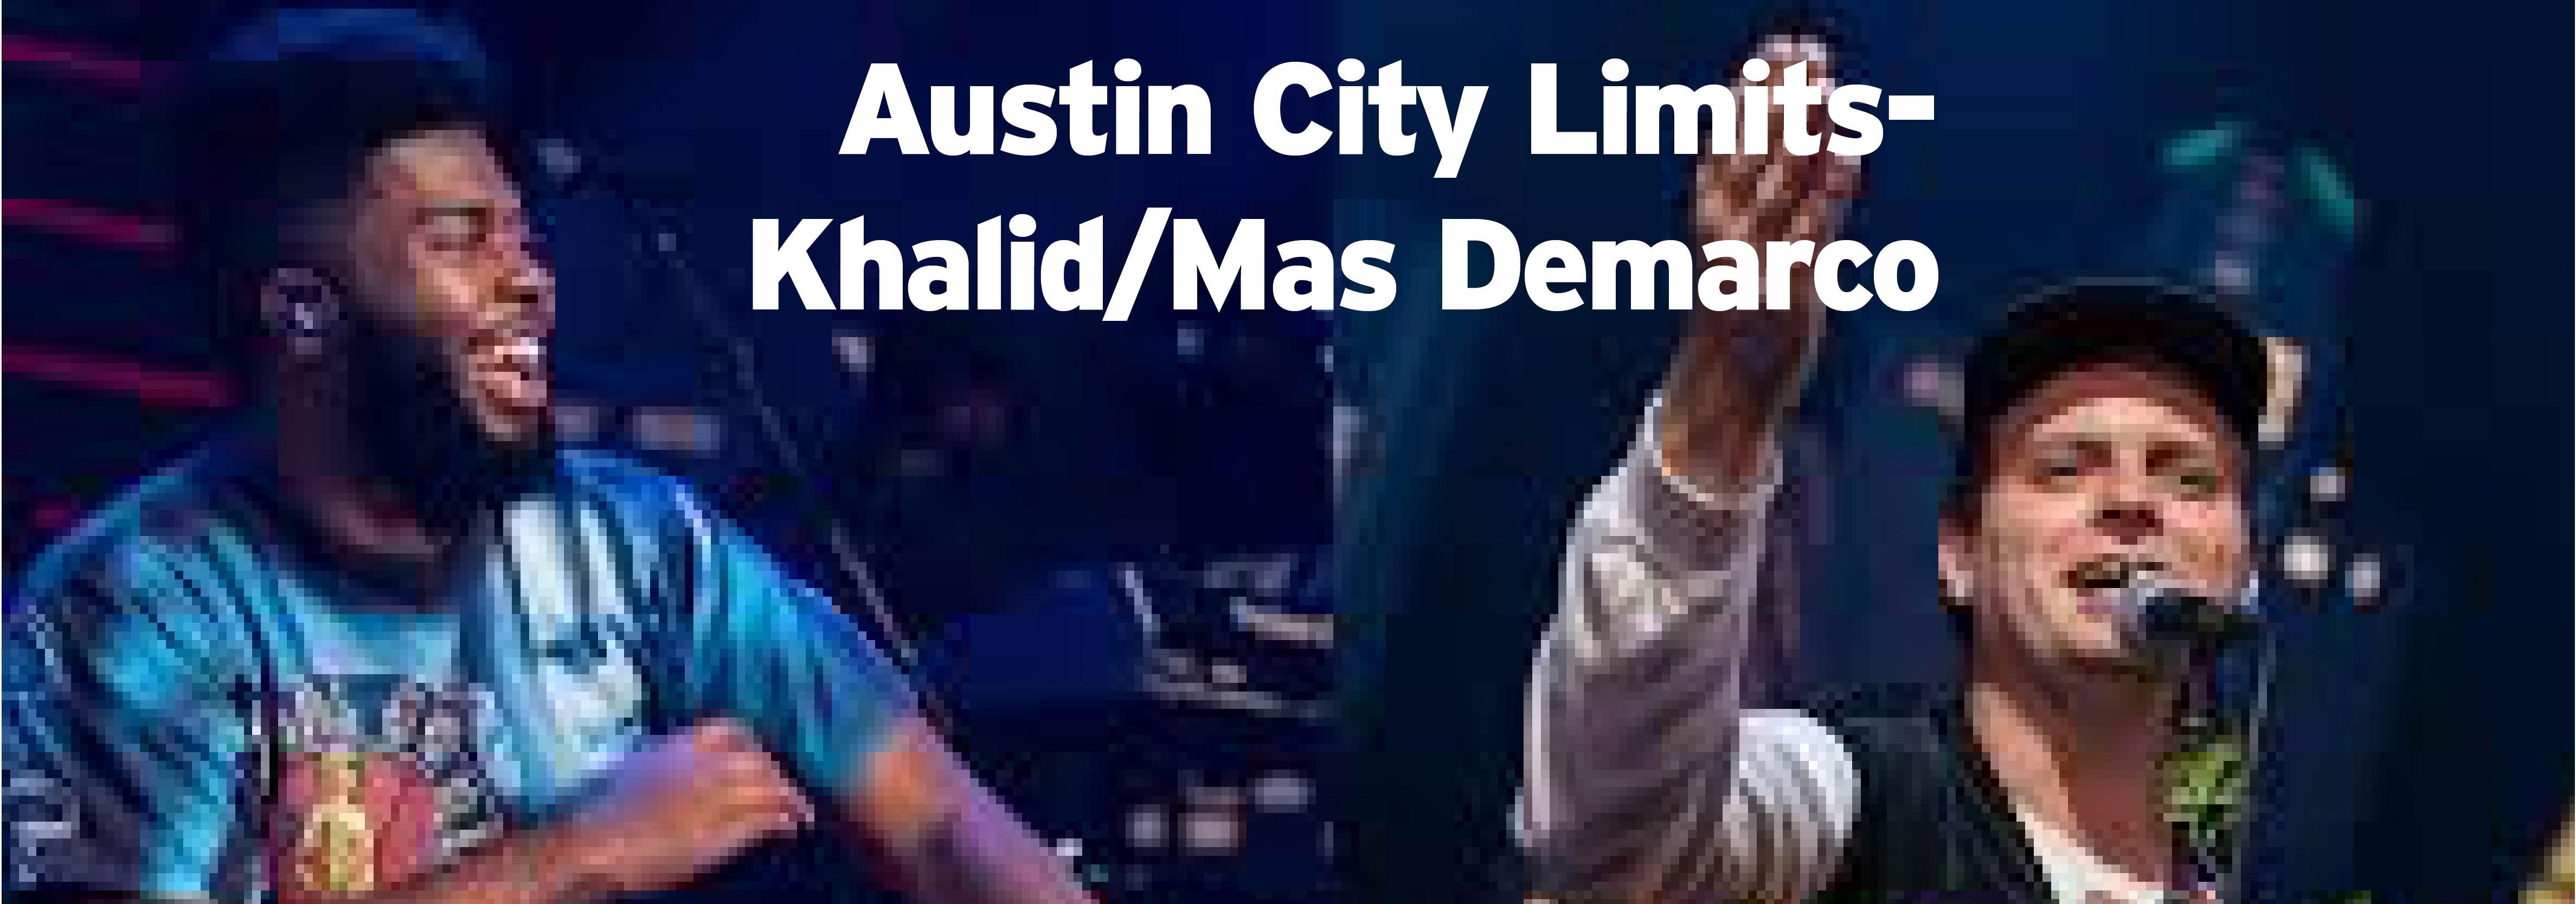 Austin City Limits–Khalid/Mas Demarco Saturday, July 20 at 11 p.m. on WCNY-TV